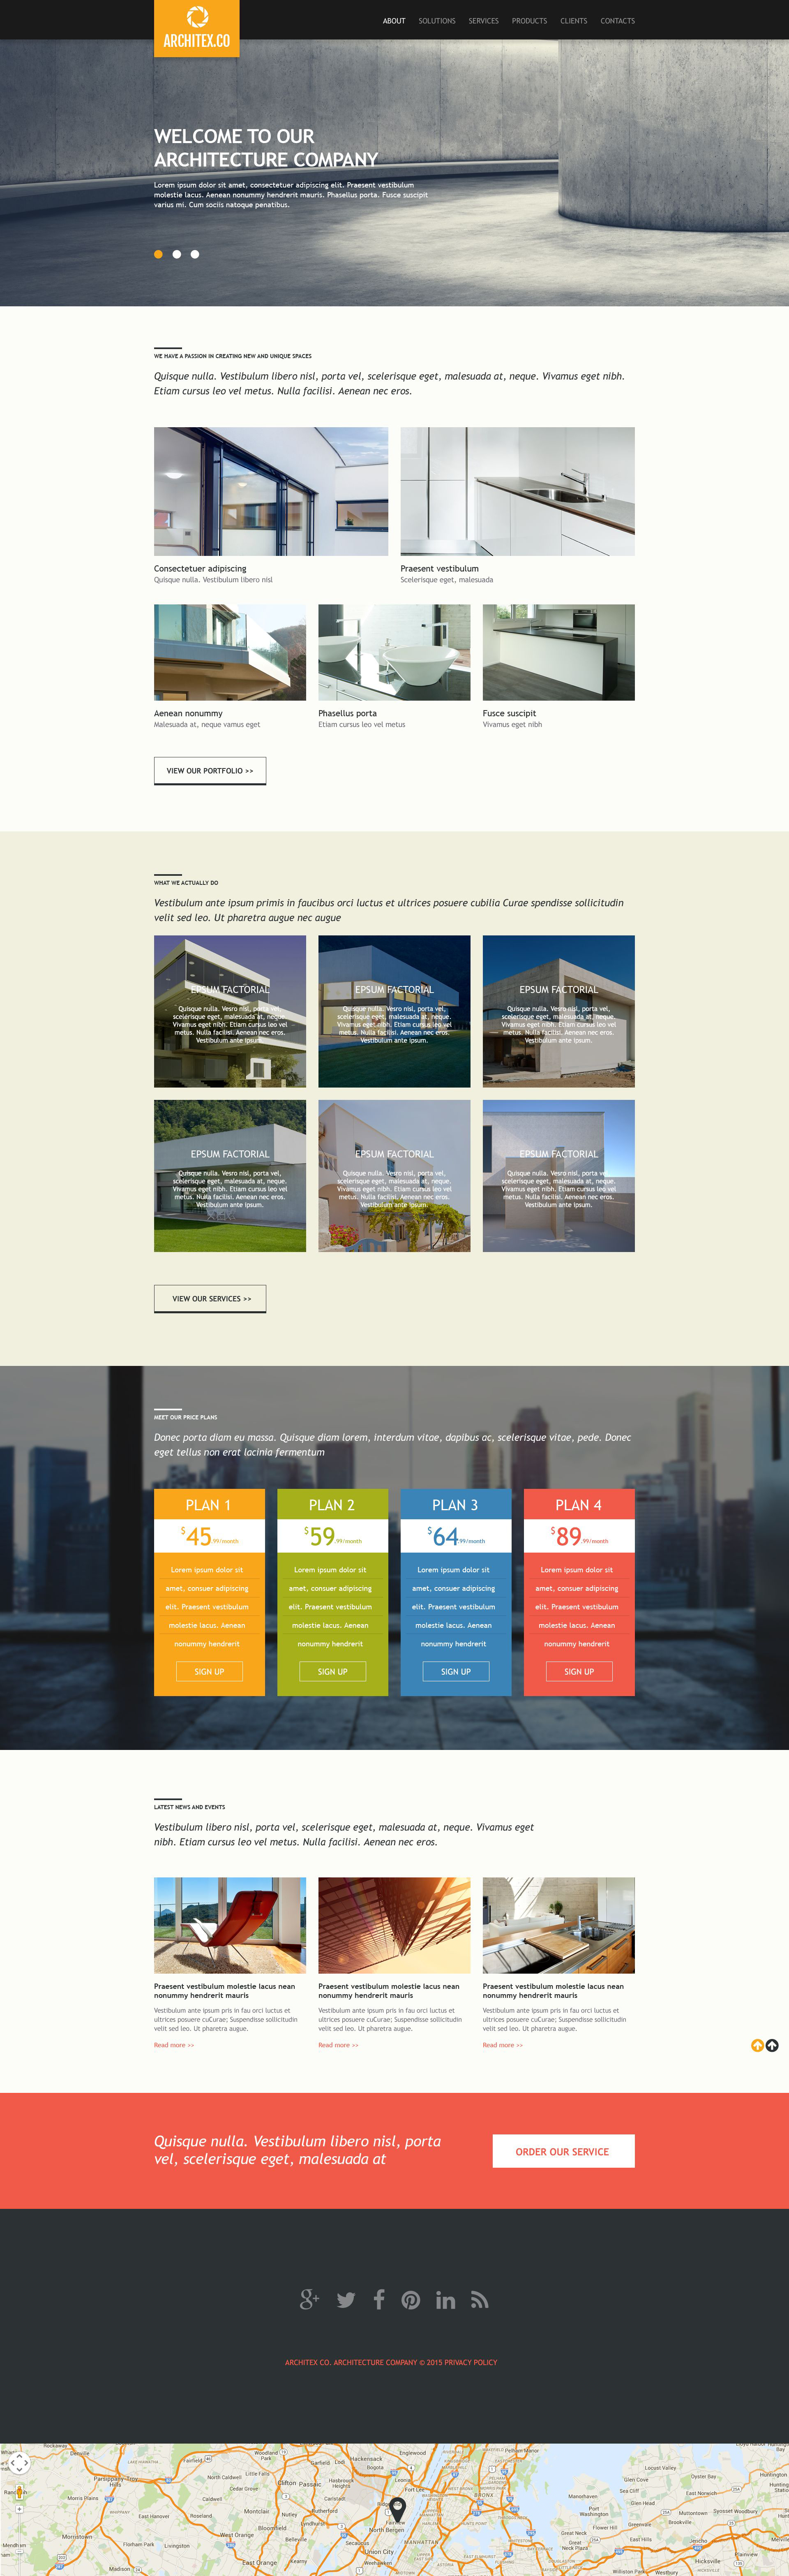 Muse šablona Architektura #52841